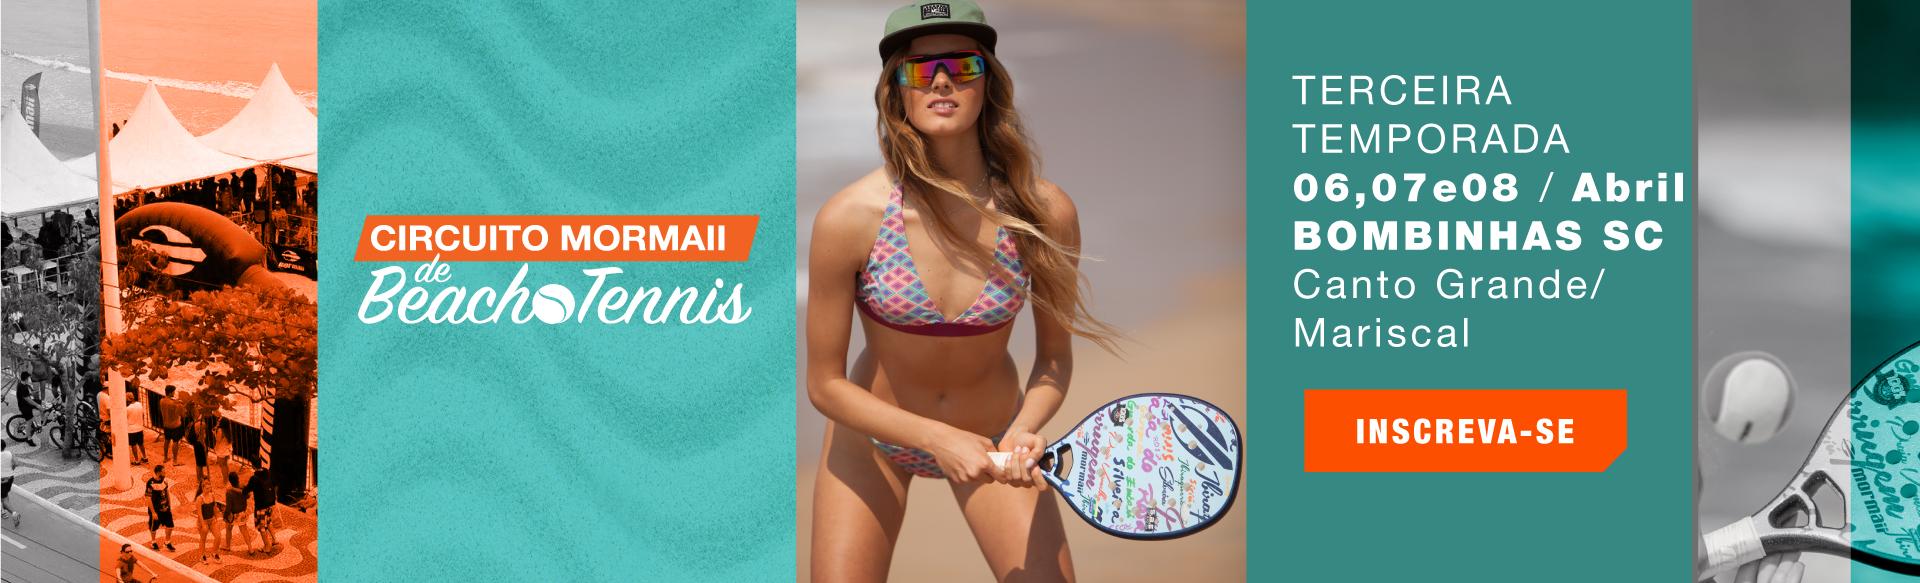 mrmaii beach tennis